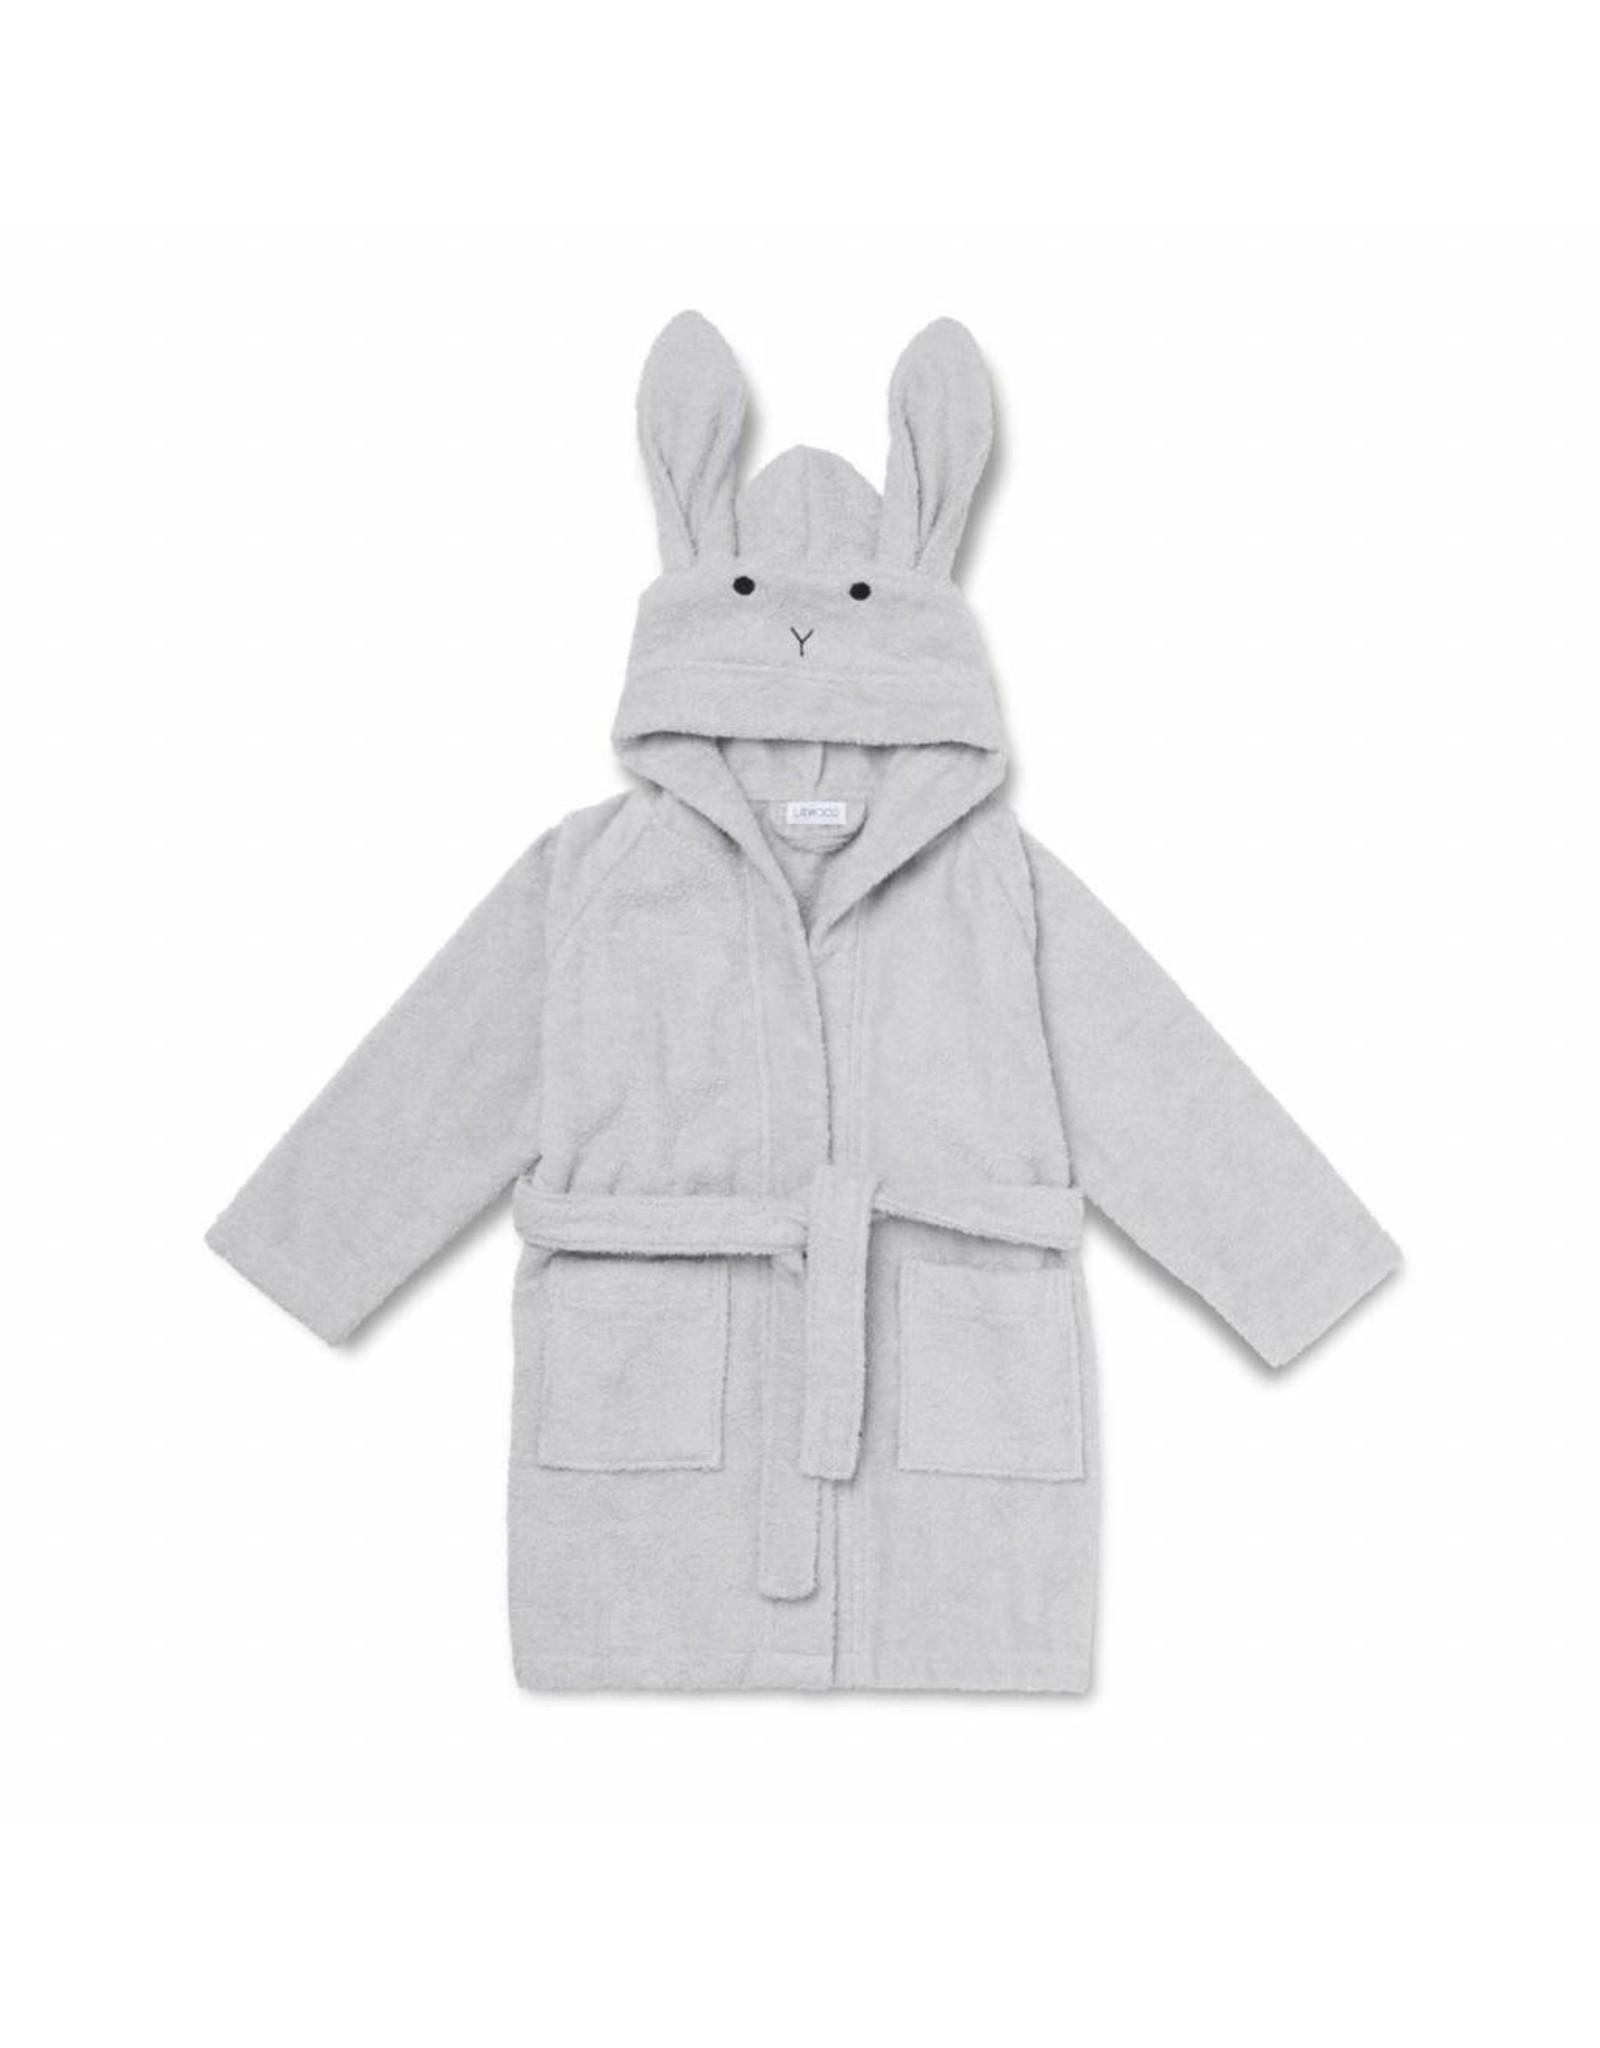 Liewood Liewood Lily badjas rabbit dumbo grey